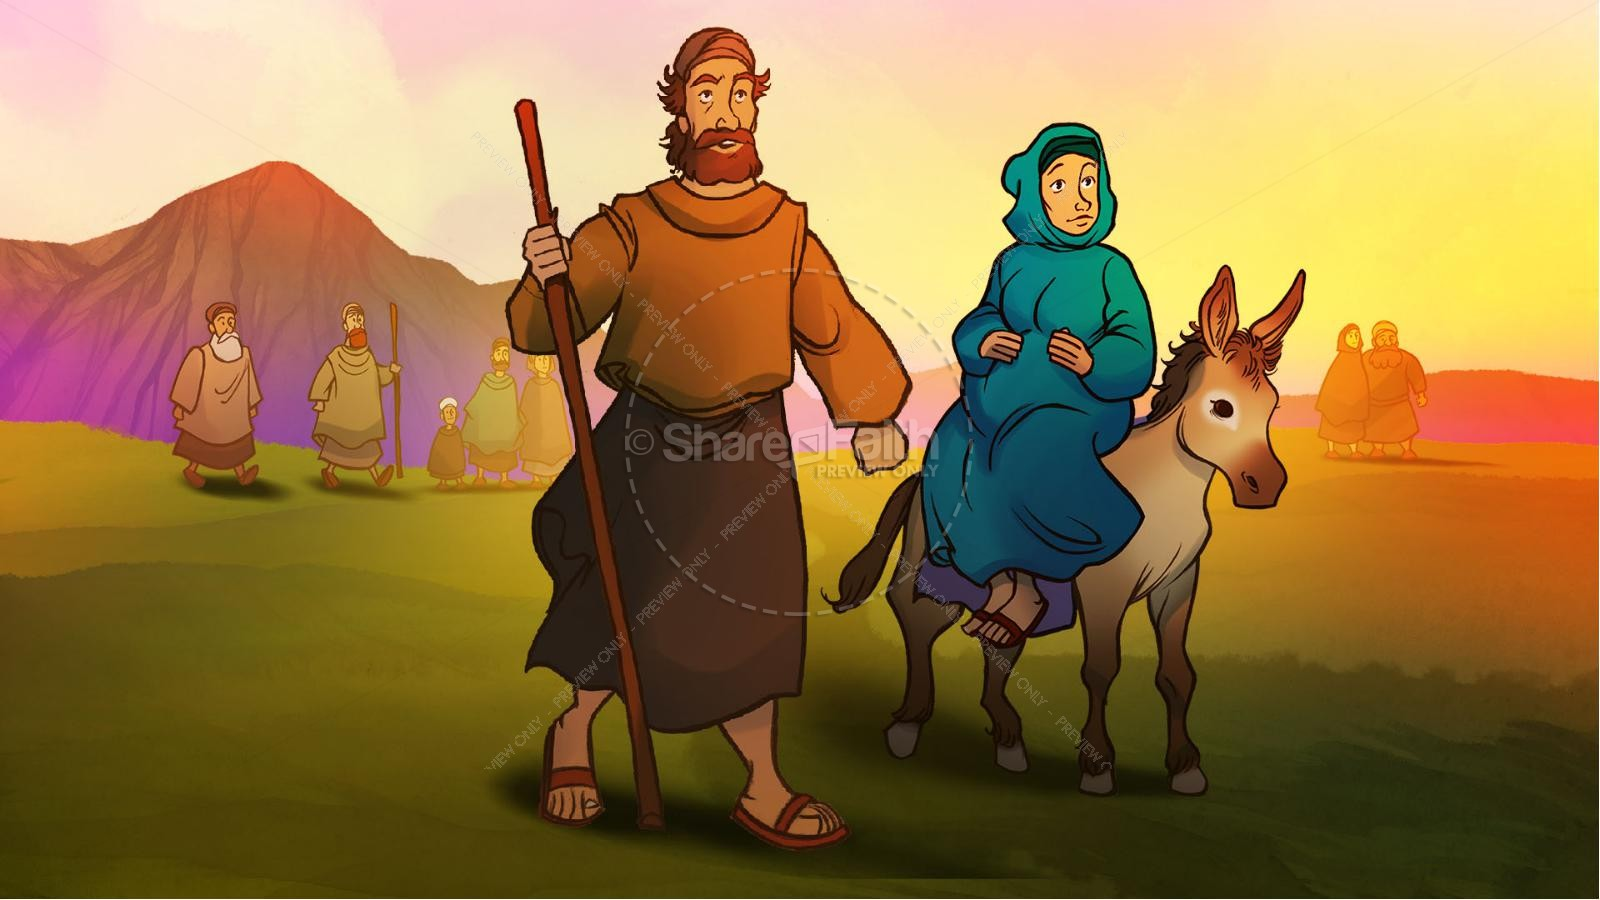 Luke 2 The Miracle of Christmas Kids Bible Story | slide 3